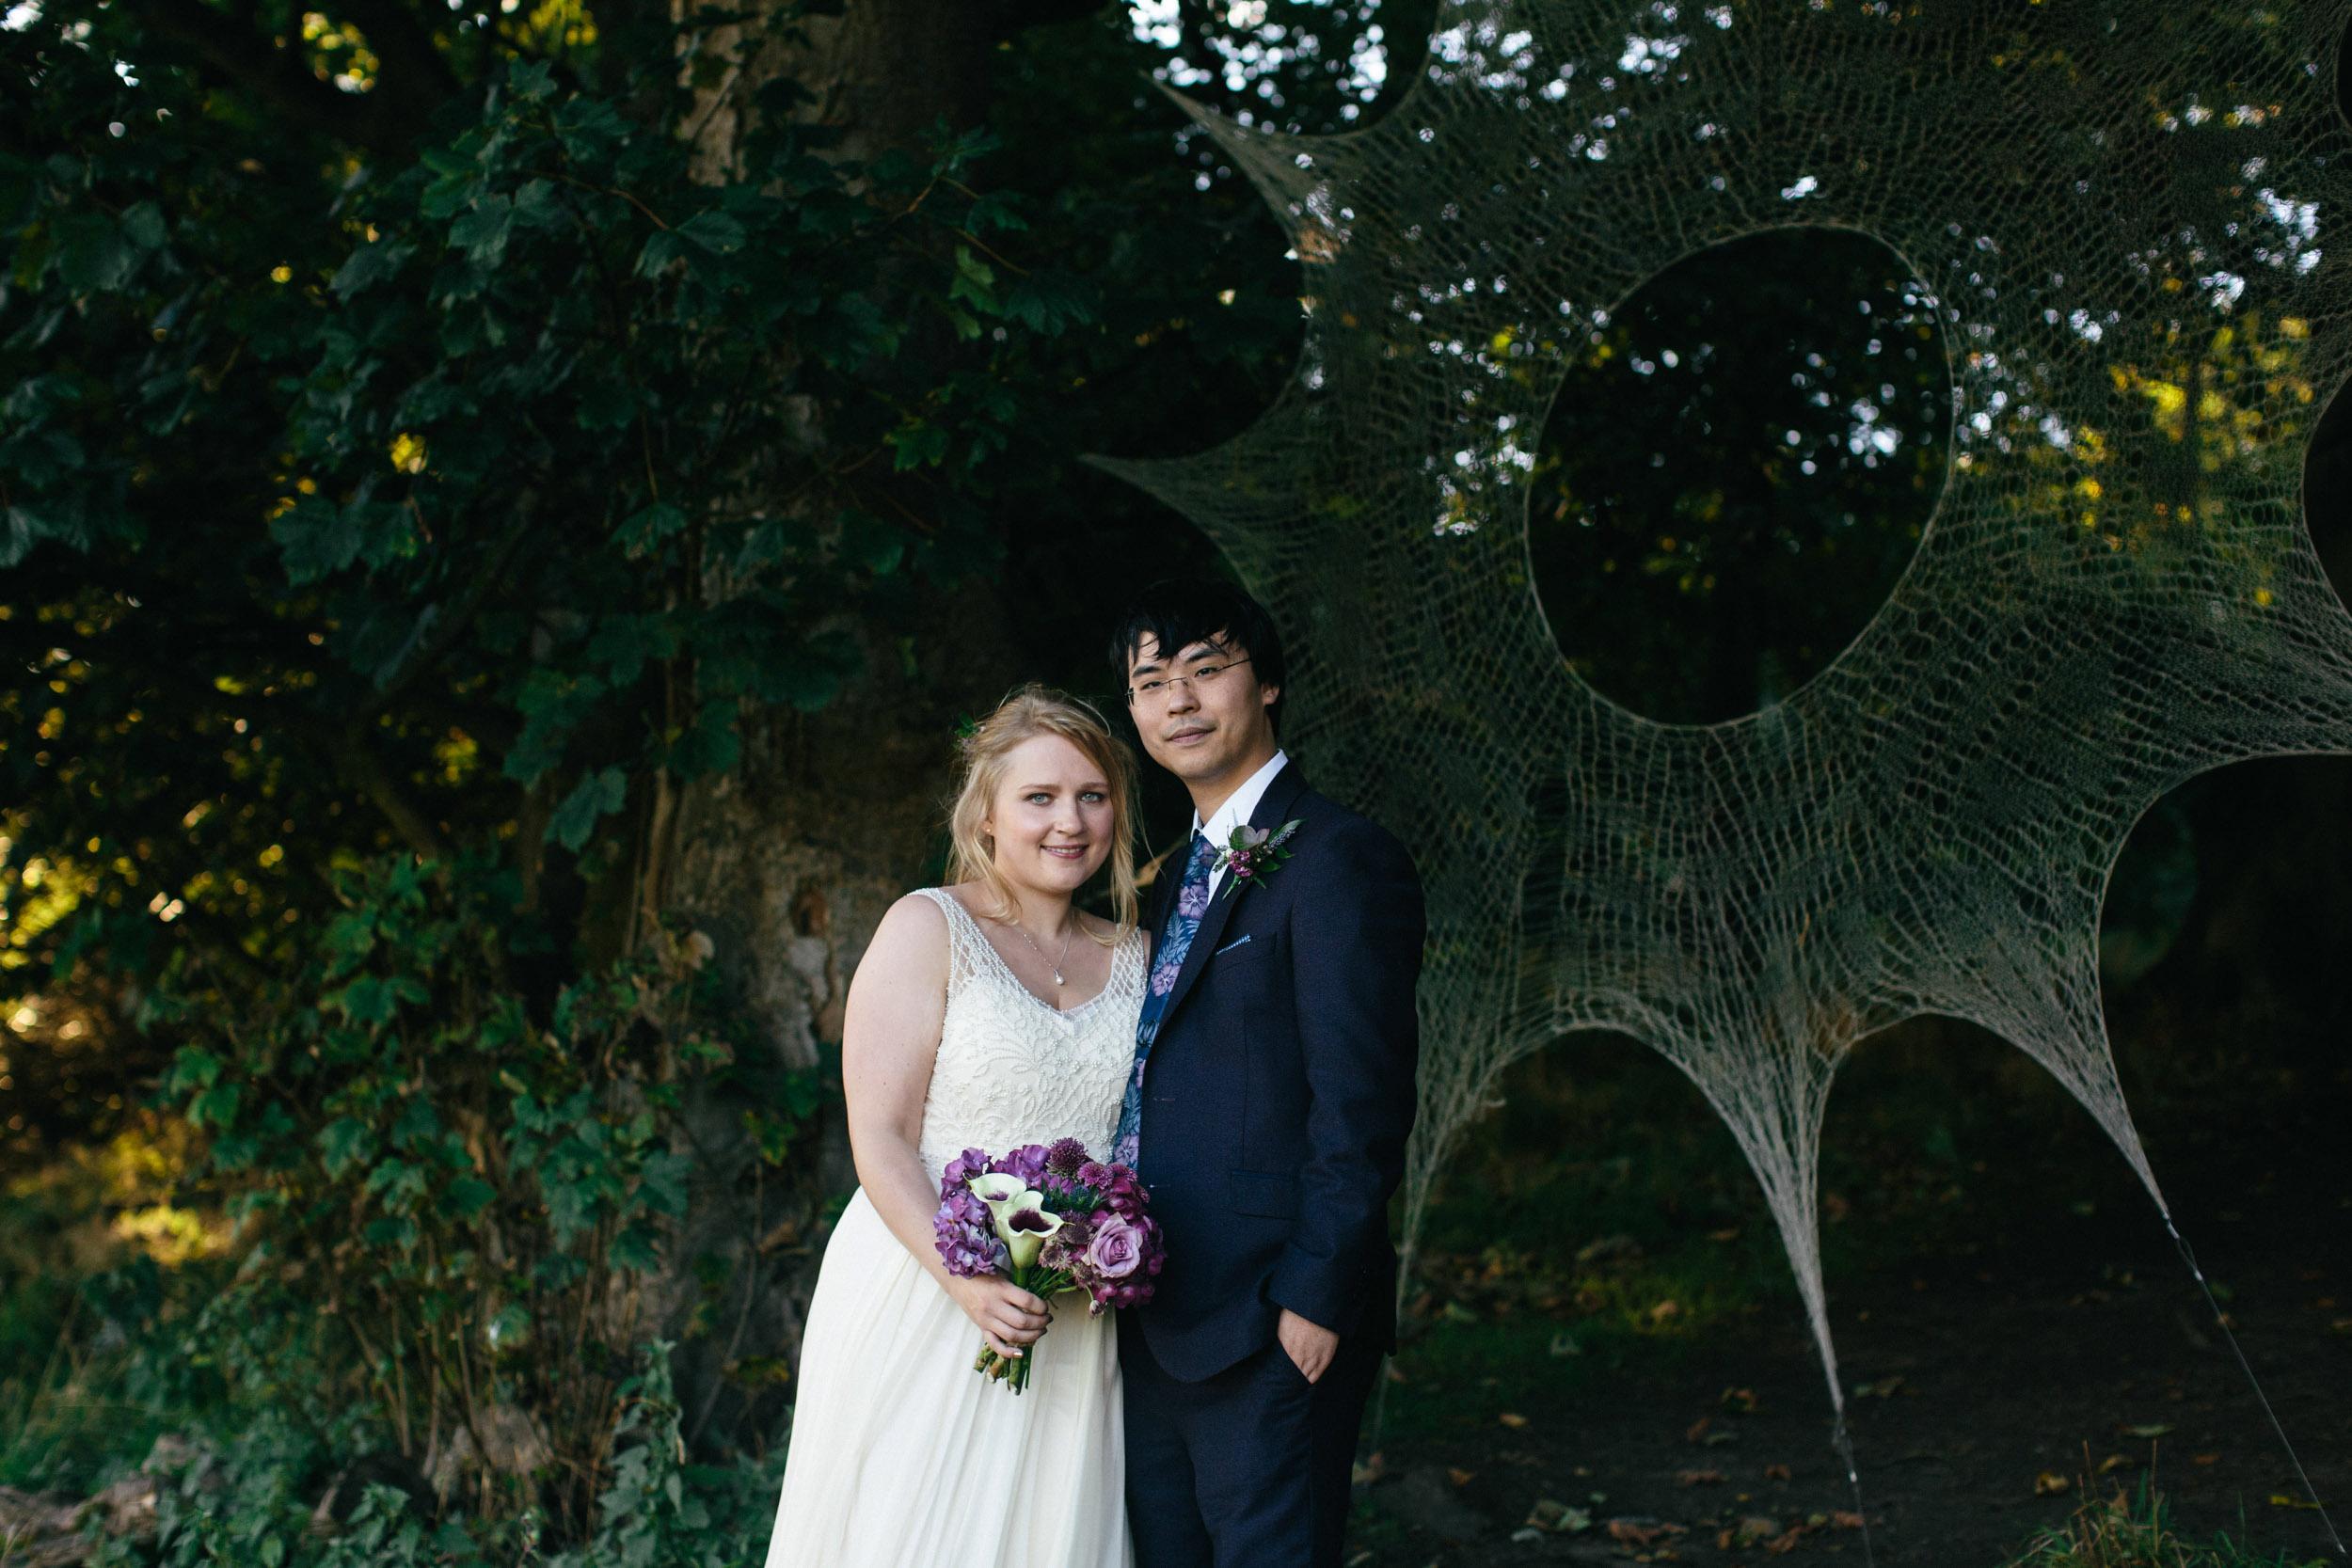 Quirky Wedding Photographer Edinburgh Jupiter Artland -57.jpg